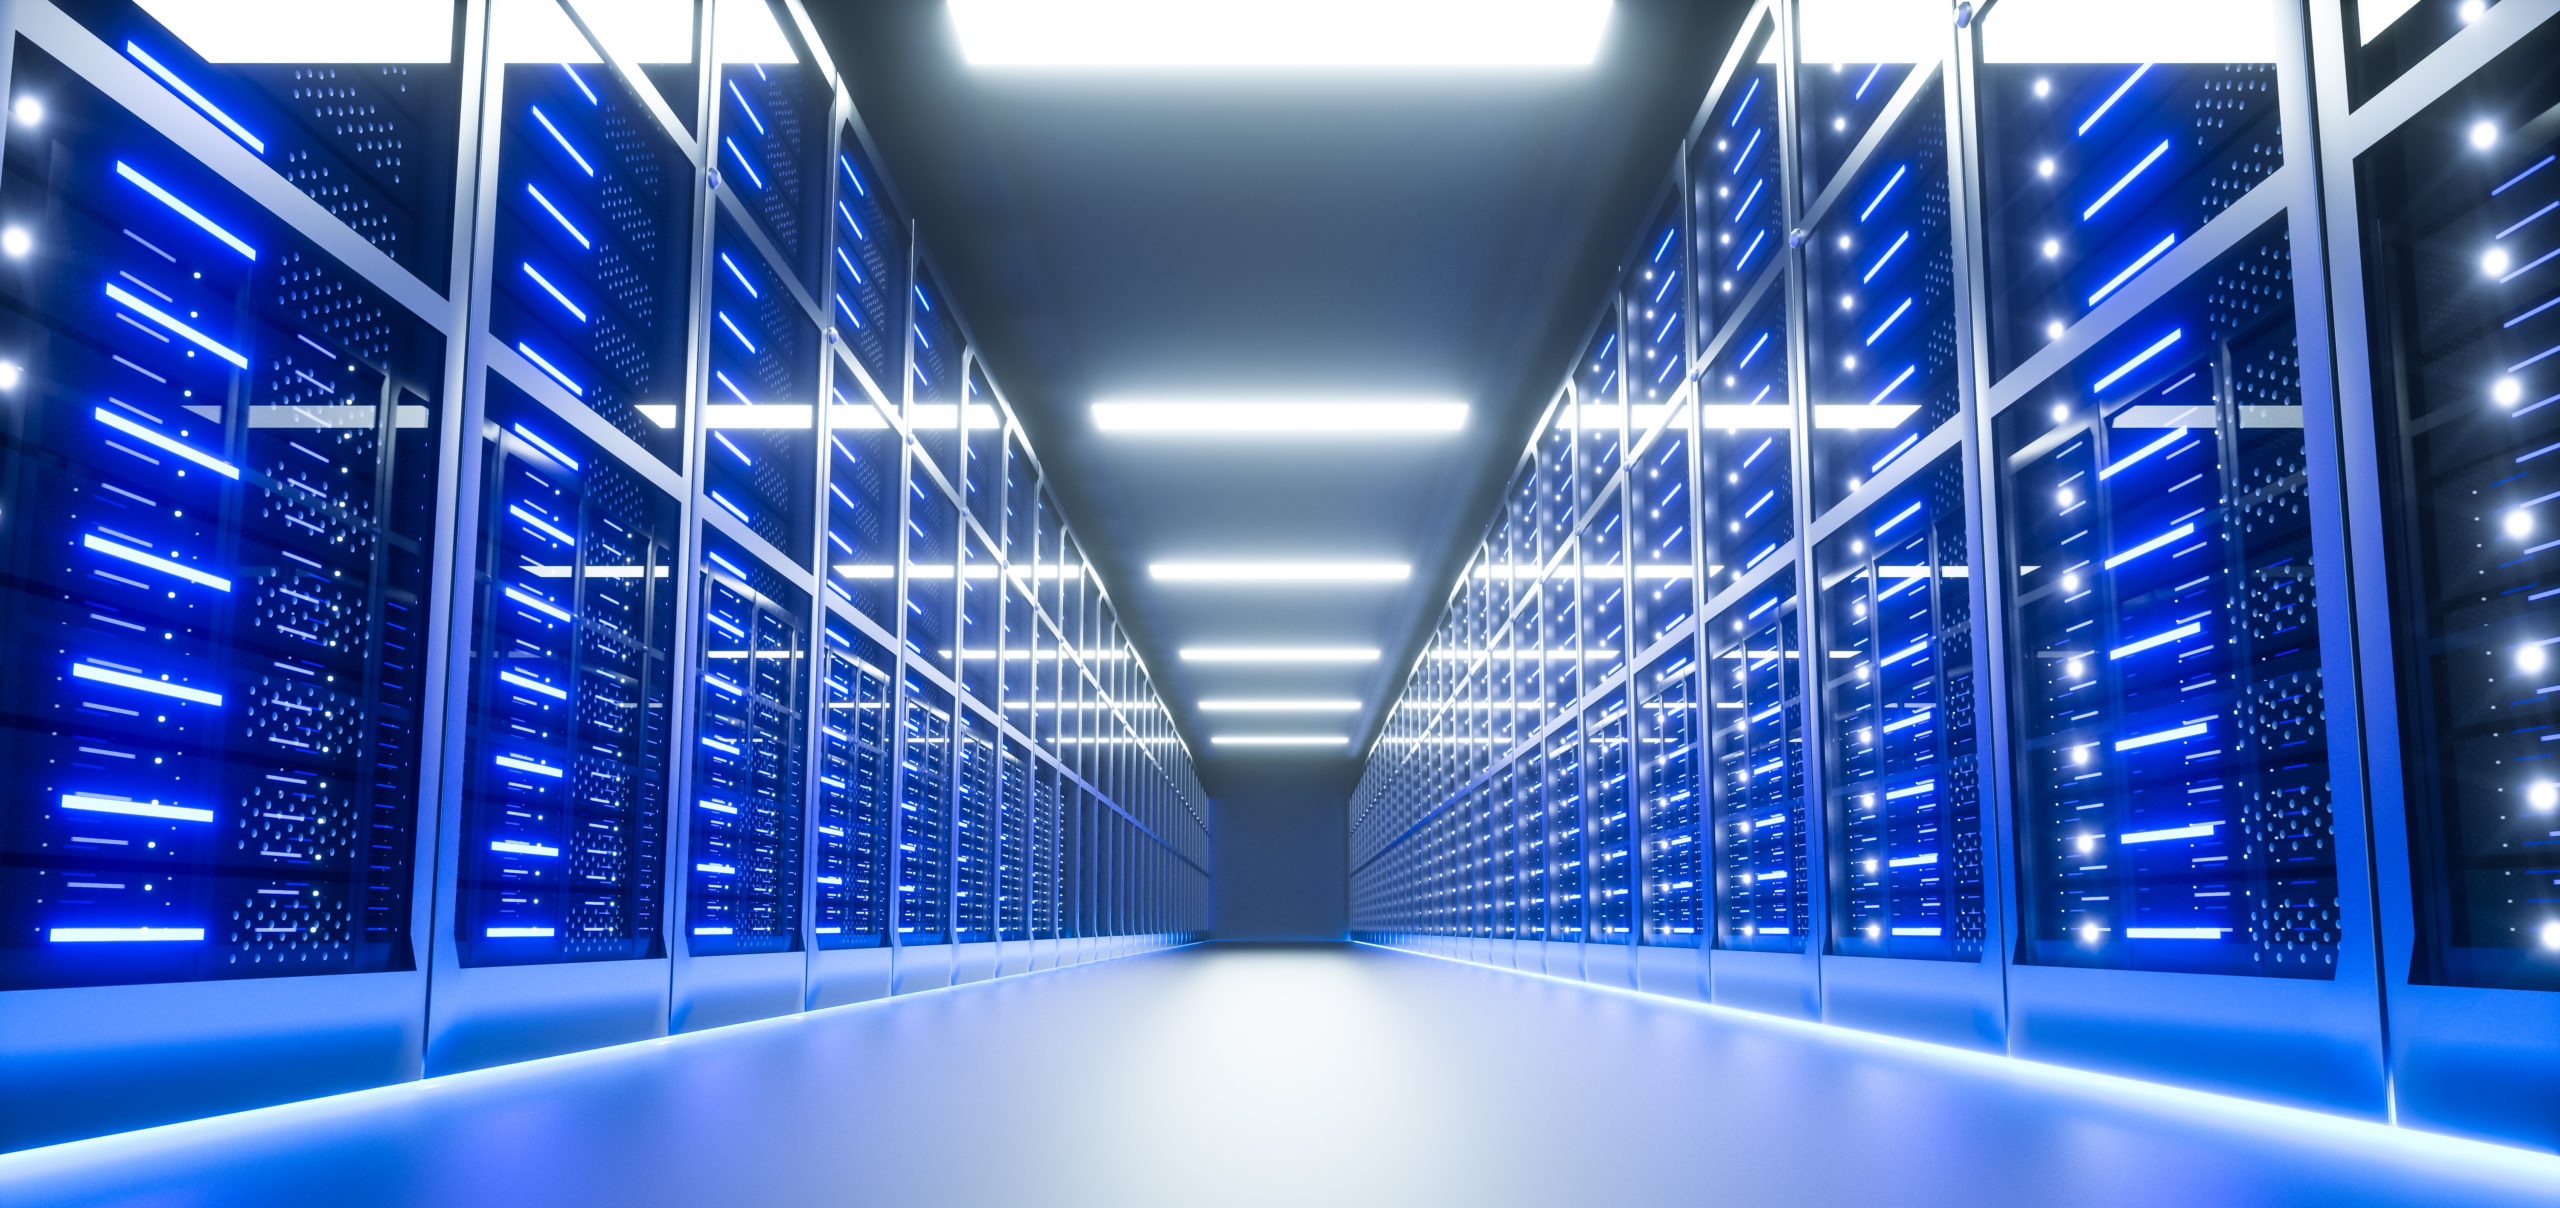 Cloud Server Room